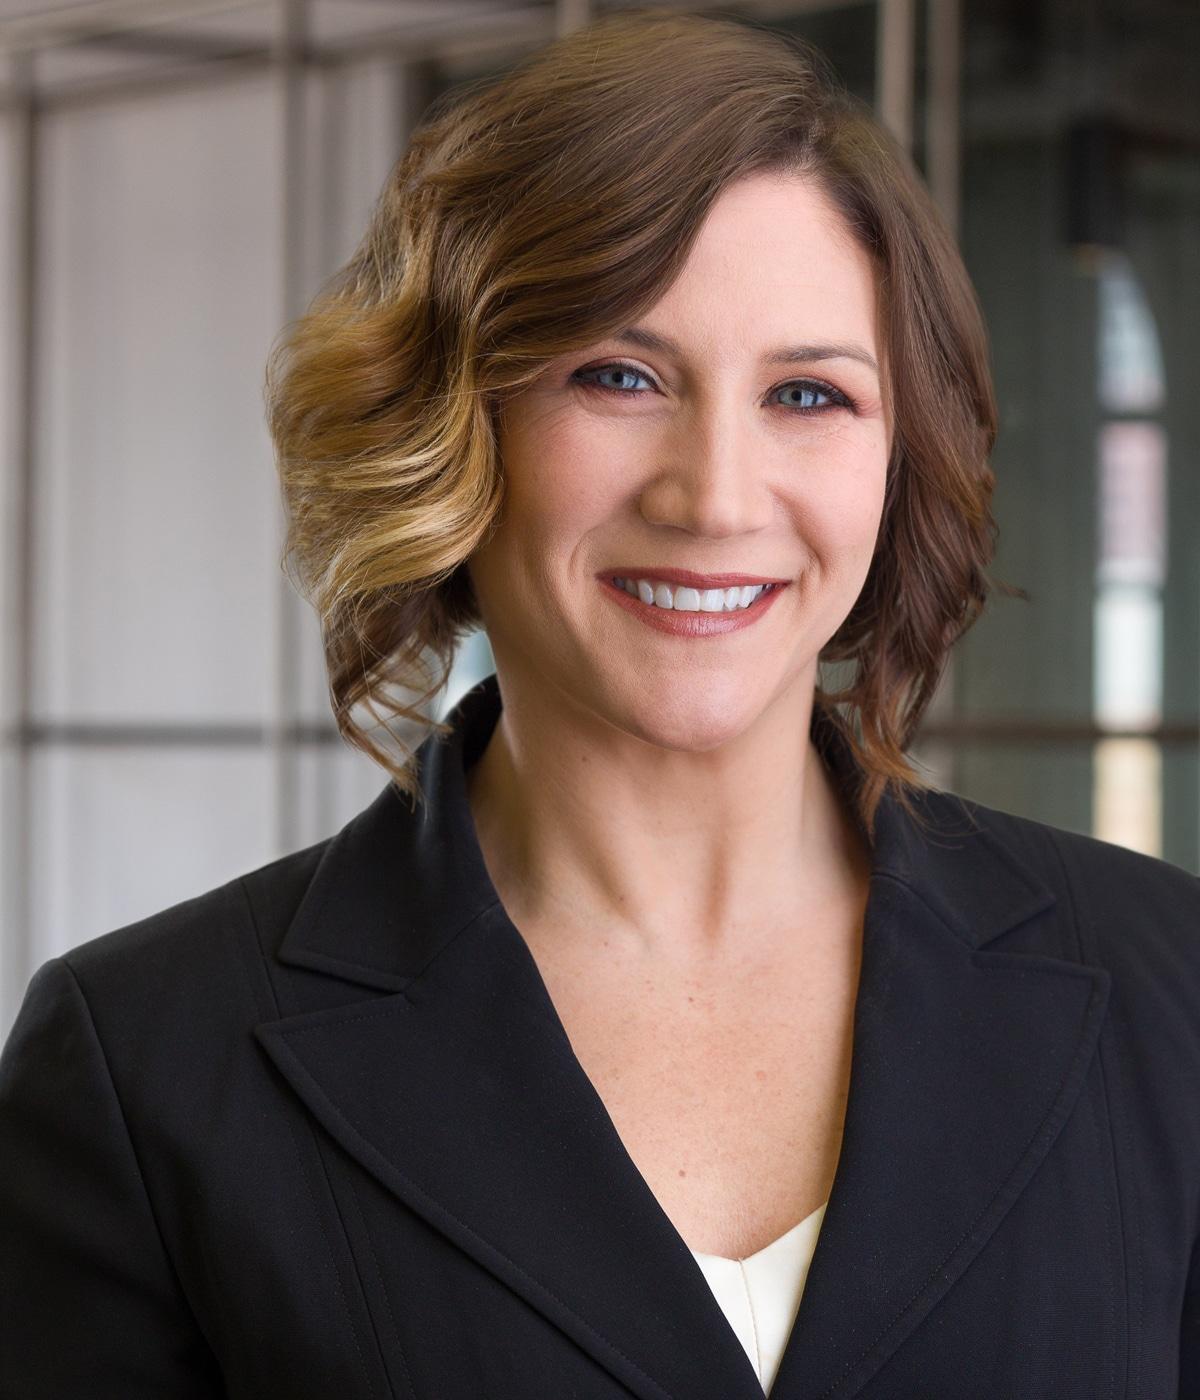 Attorney Ashlie CaseSletvold